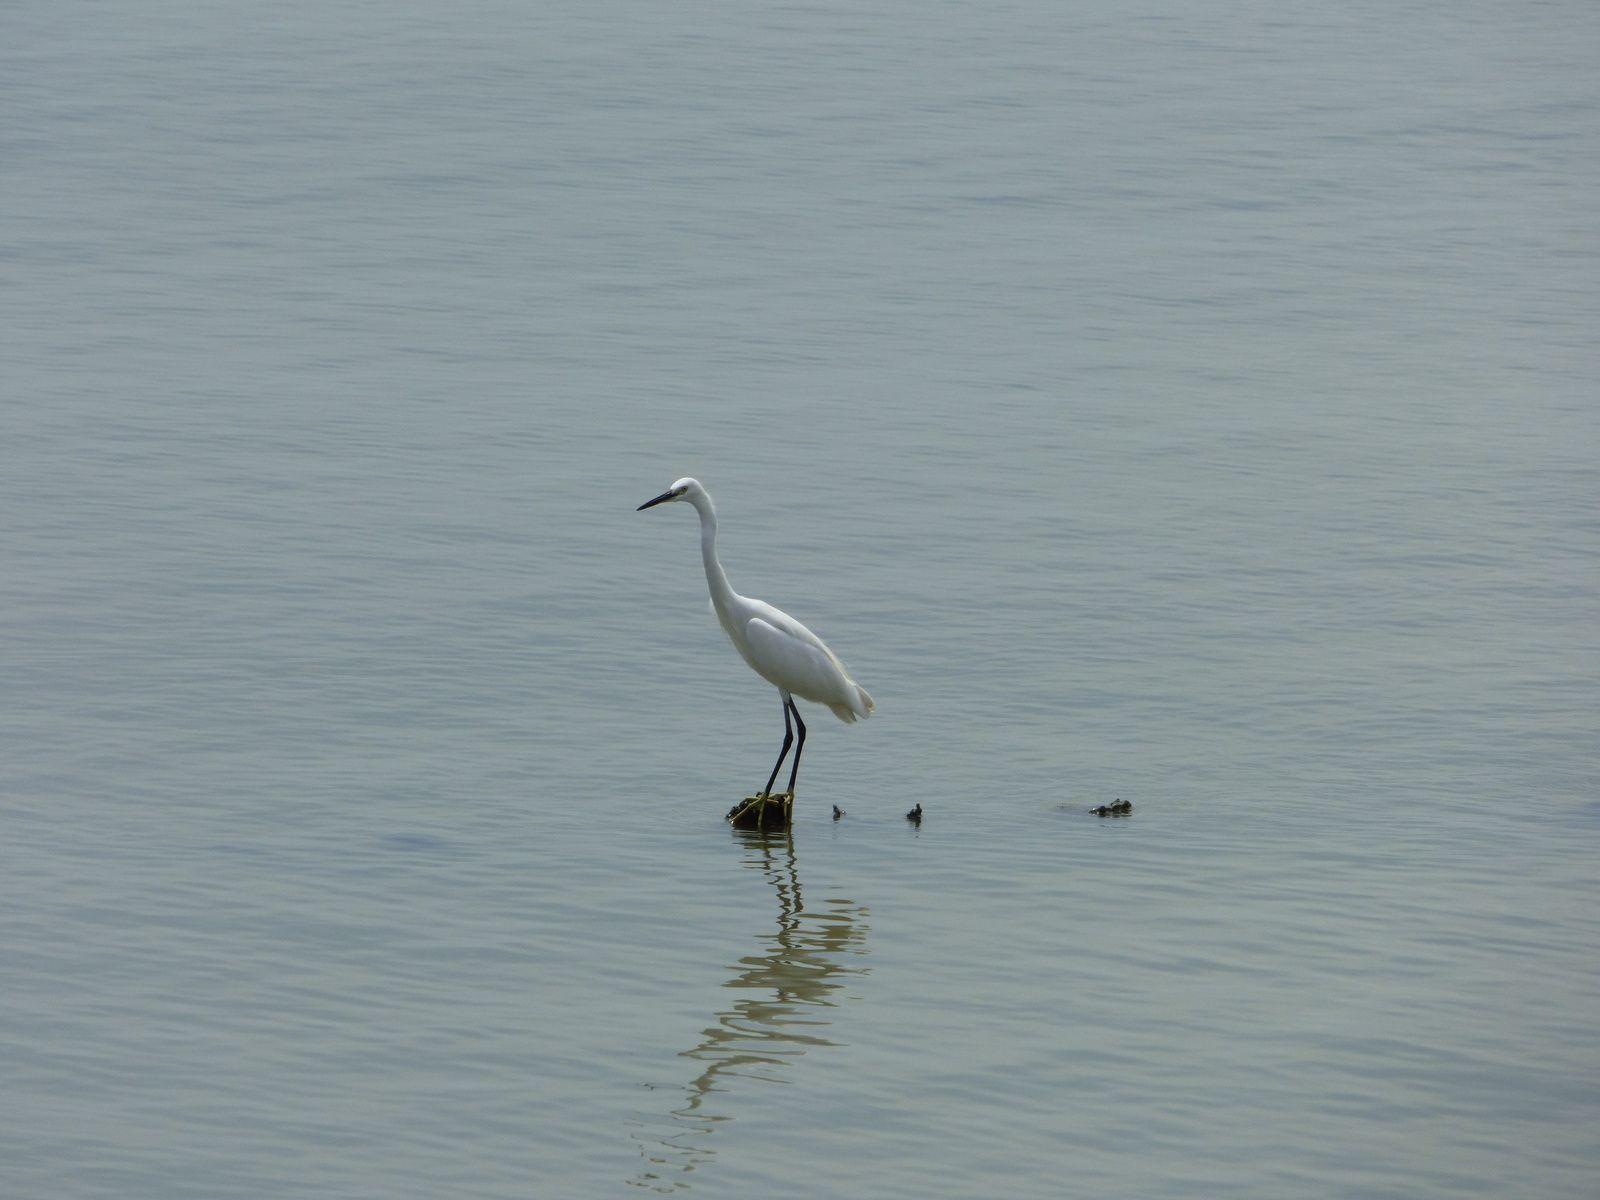 Mangrove reserve park 红树林海滨生态公园, Shenzhen 深圳